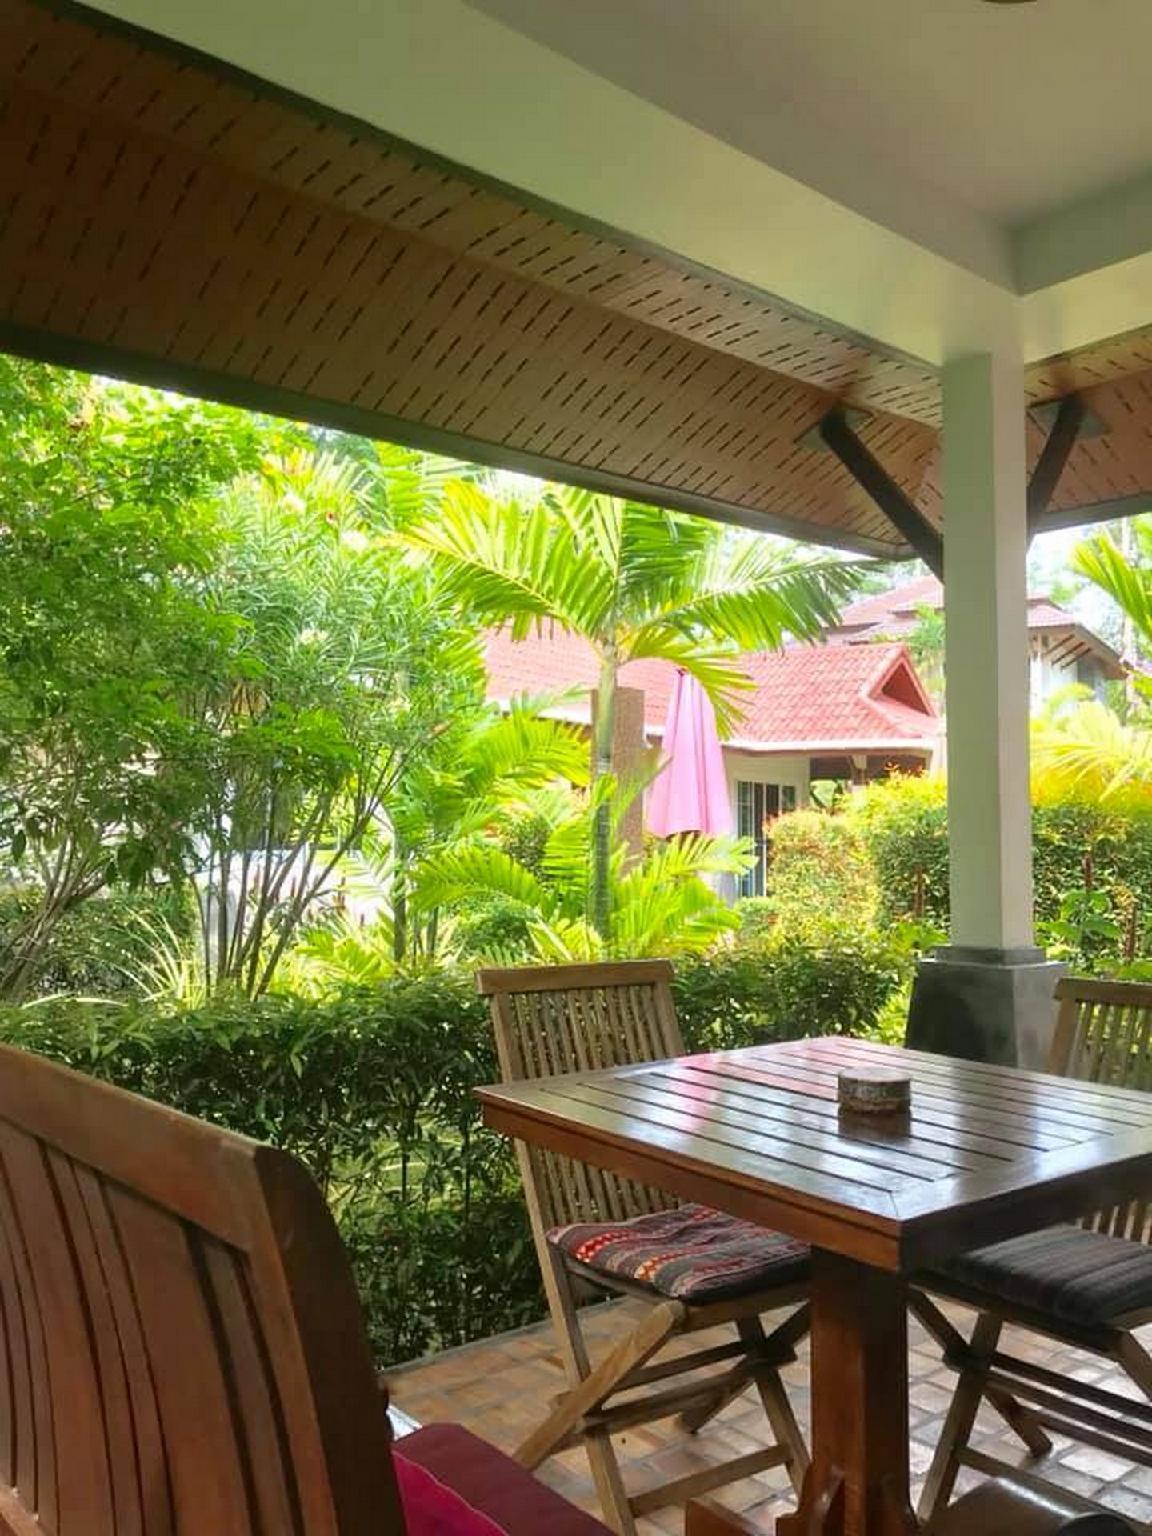 L2, Cosy Cottages with 1 pool to share วิลลา 2 ห้องนอน 2 ห้องน้ำส่วนตัว ขนาด 75 ตร.ม. – หาดพระแอะ